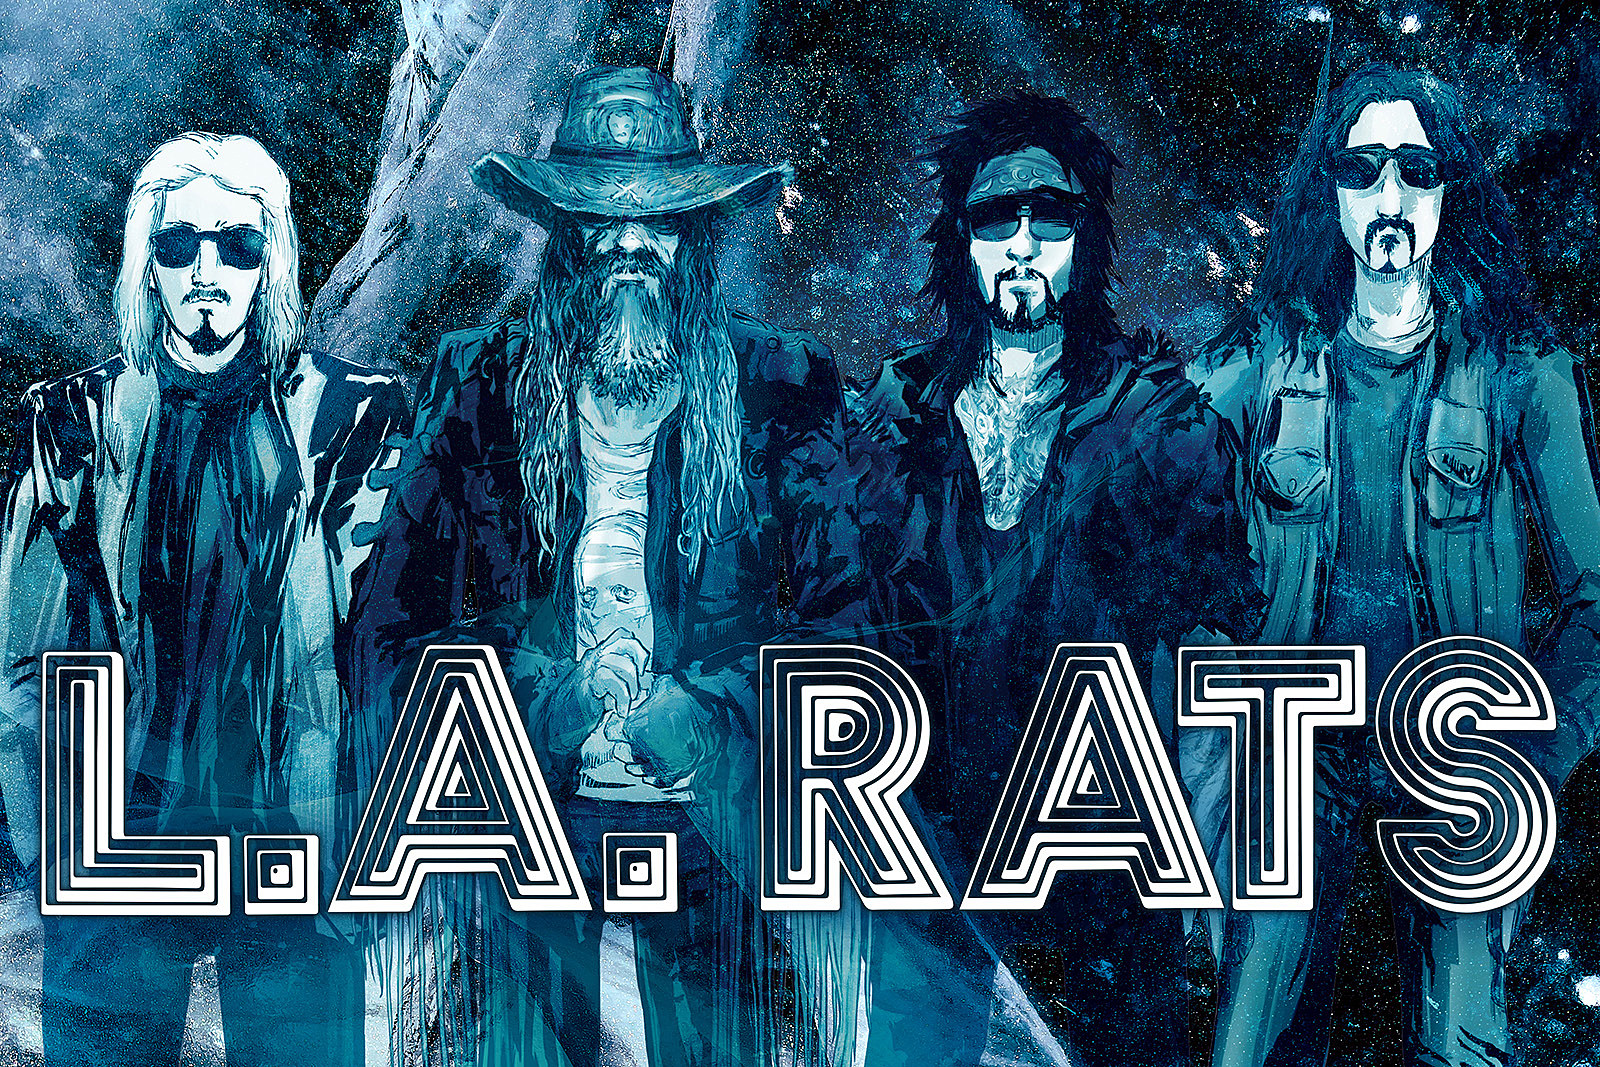 L.A. Rats - Nuevo supergrupo con Rob Zombie, Nikki Sixx, John 5 y Tommy Clufetos Larats